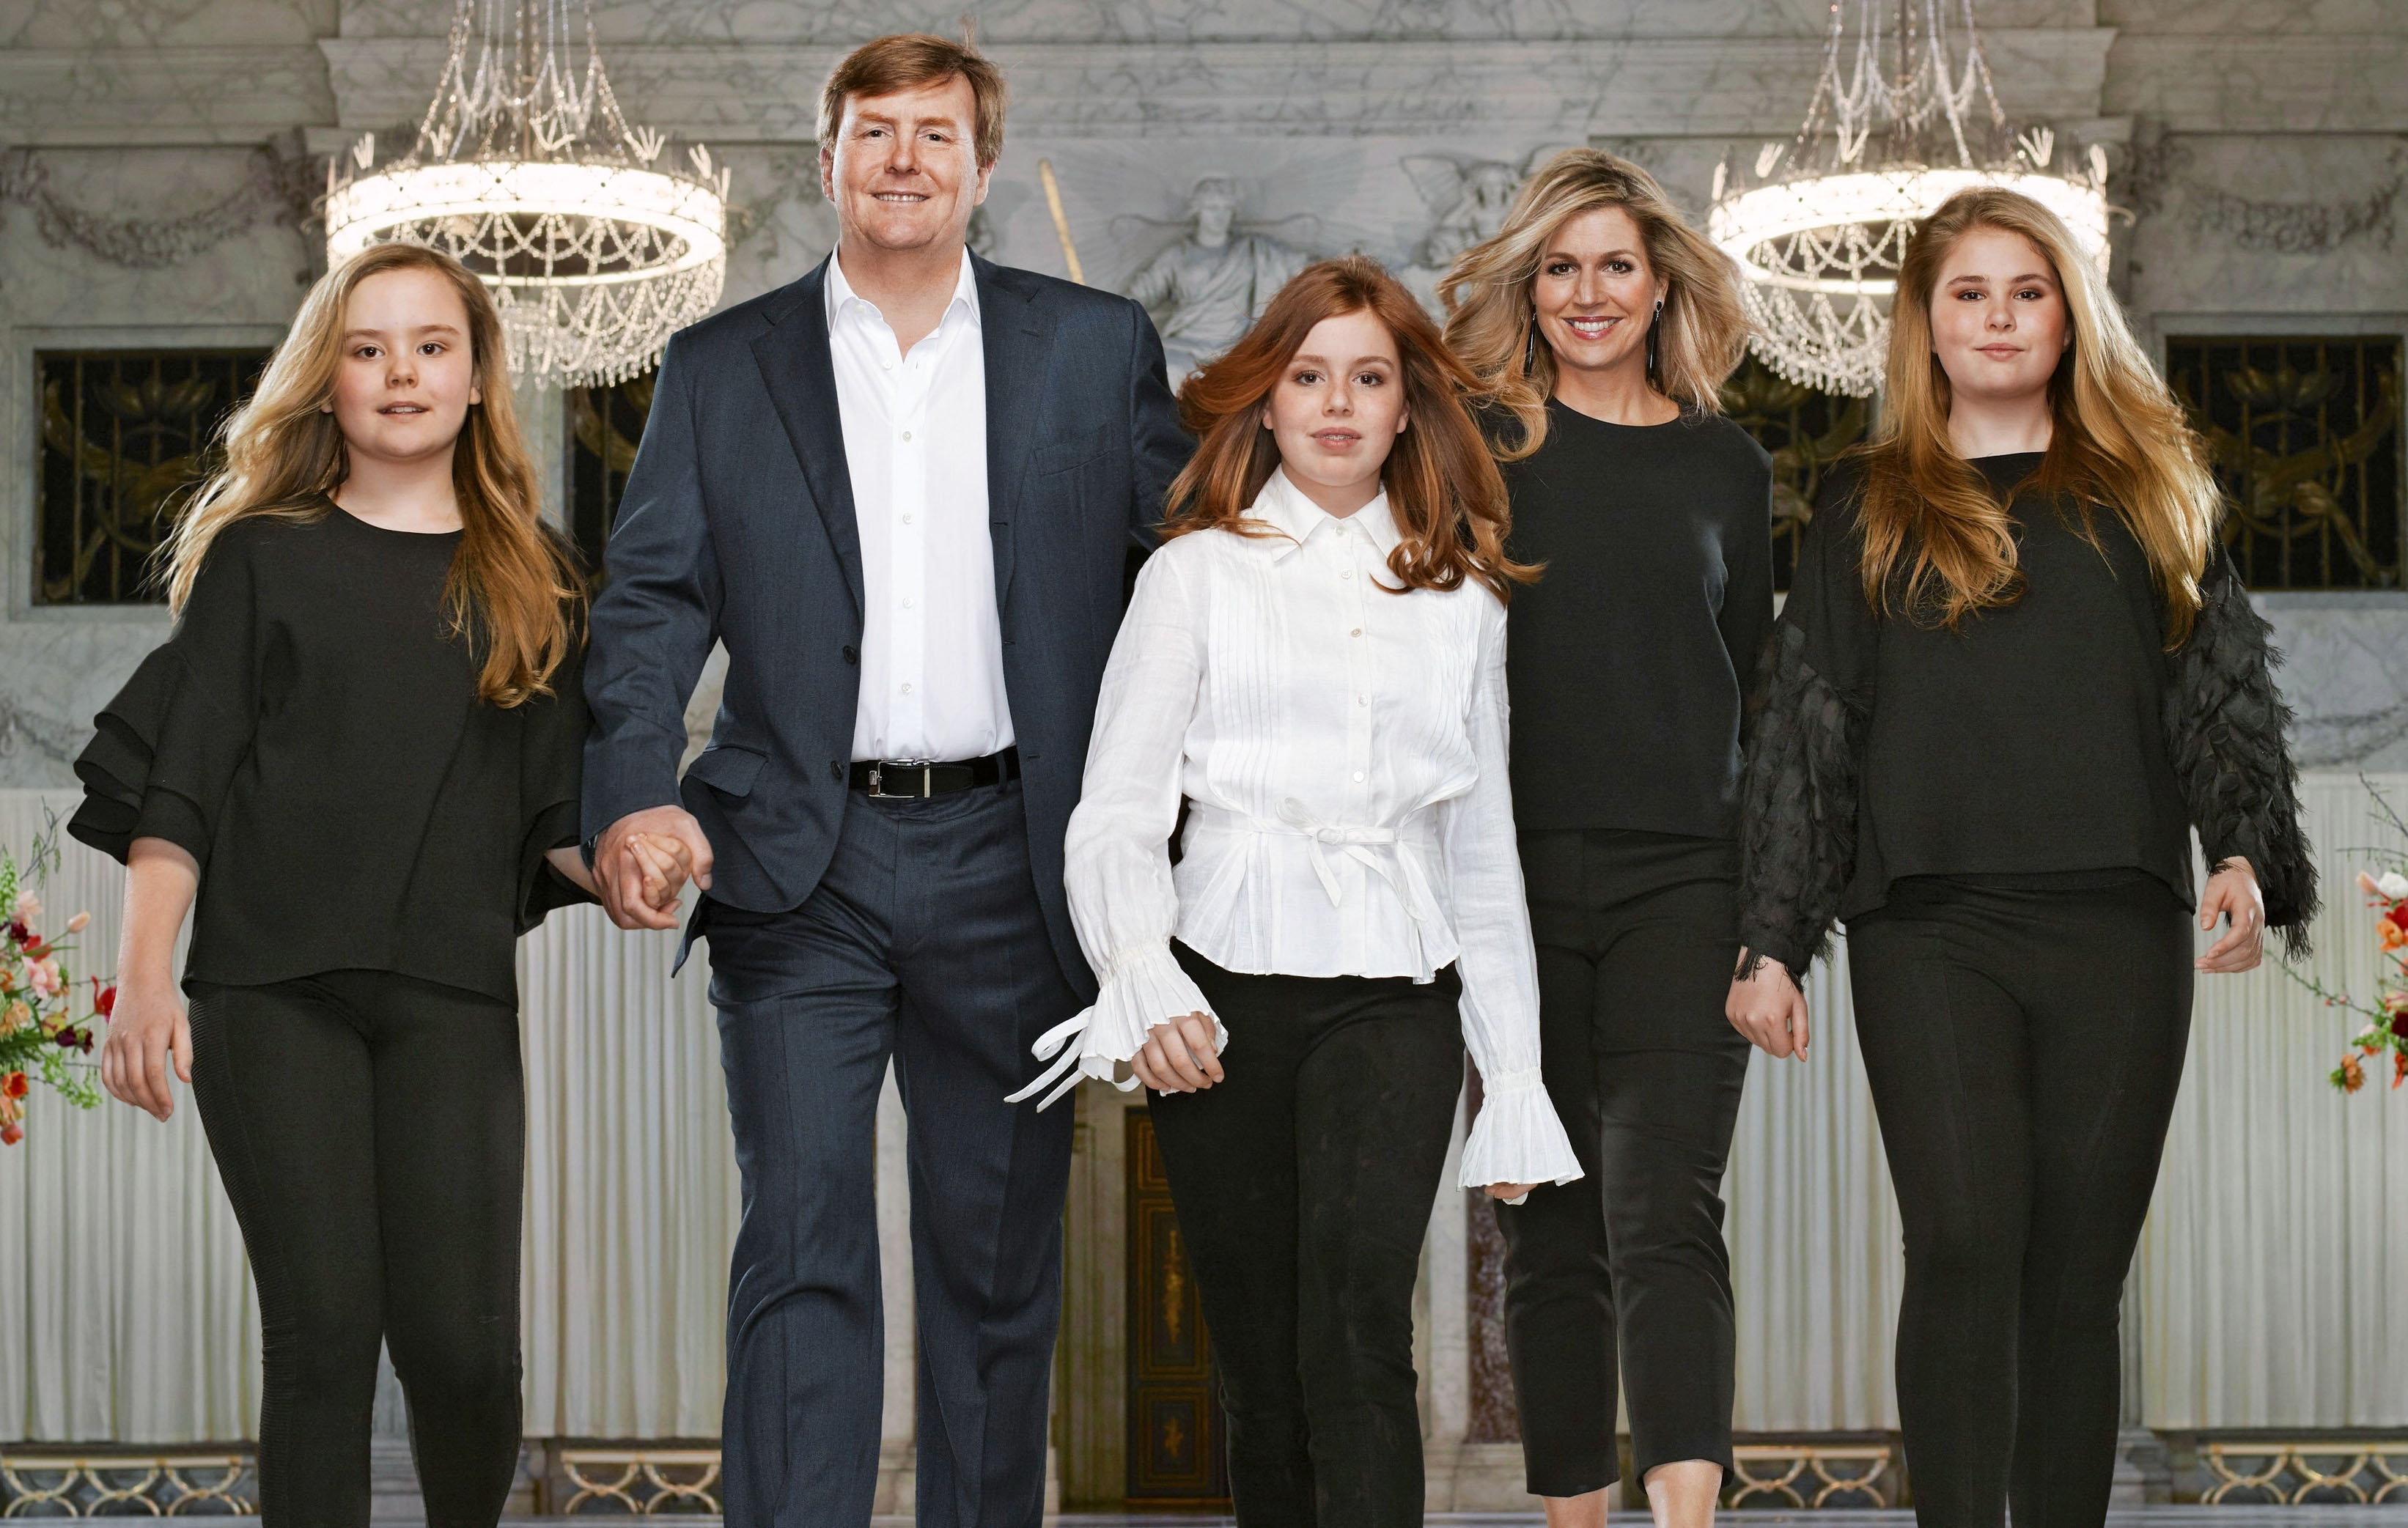 Hollannin kuningasperhe, kuningas Willem-Alexander, kuningatar Máxima